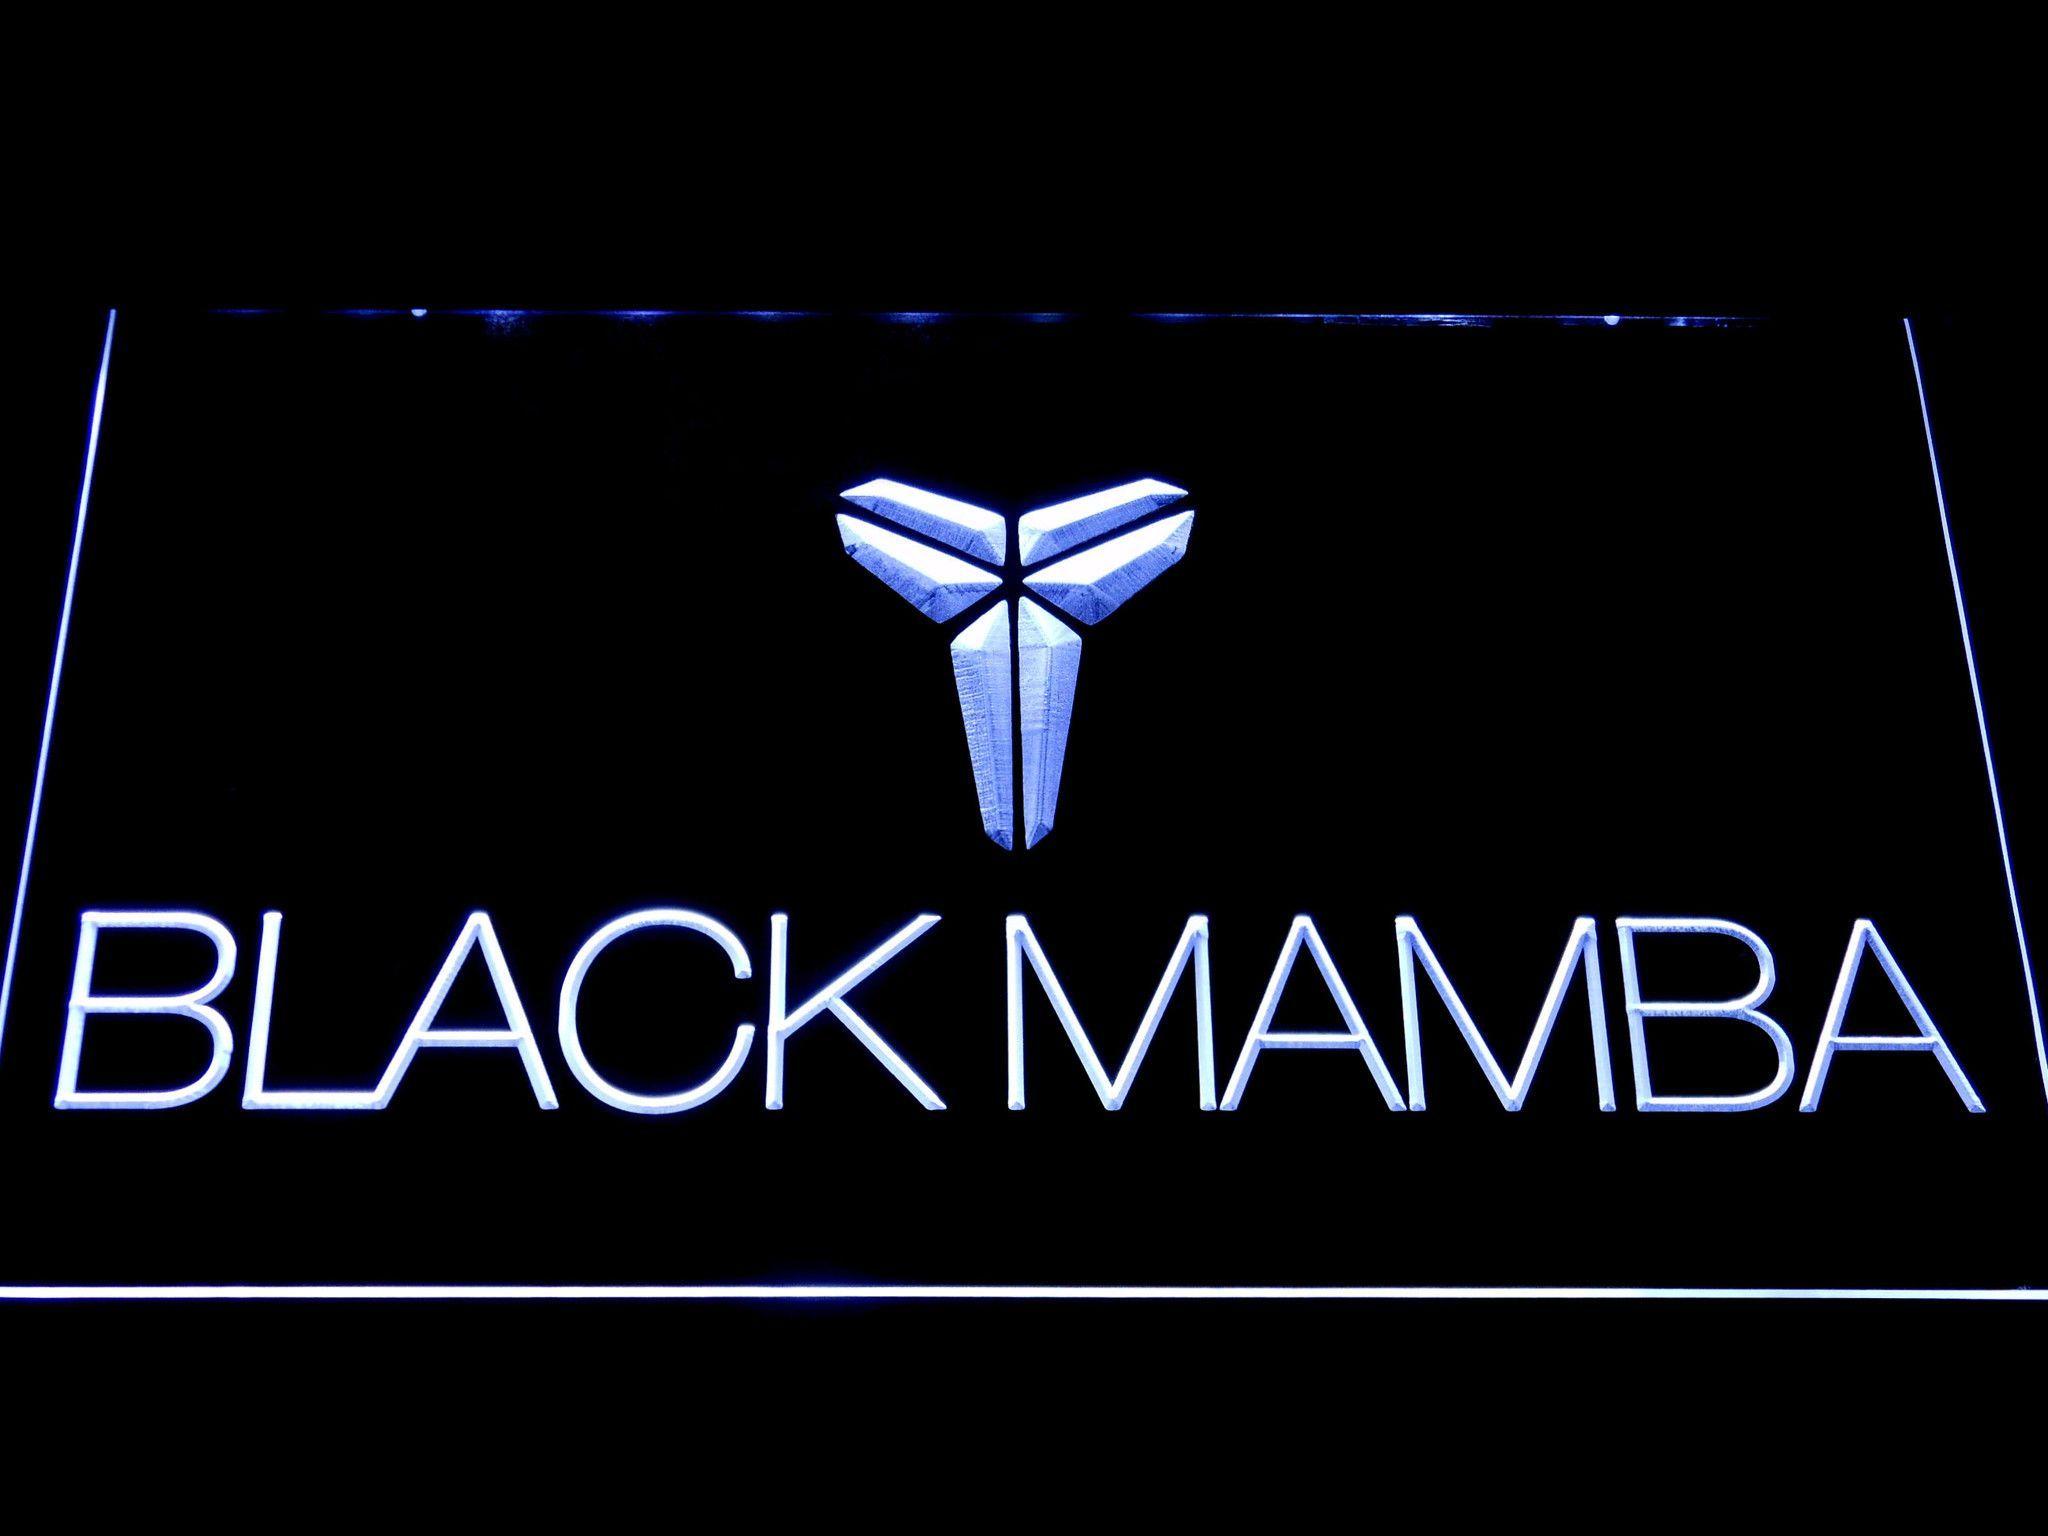 Los Angeles Lakers Kobe Bryant Black Mamba Logo LED Neon